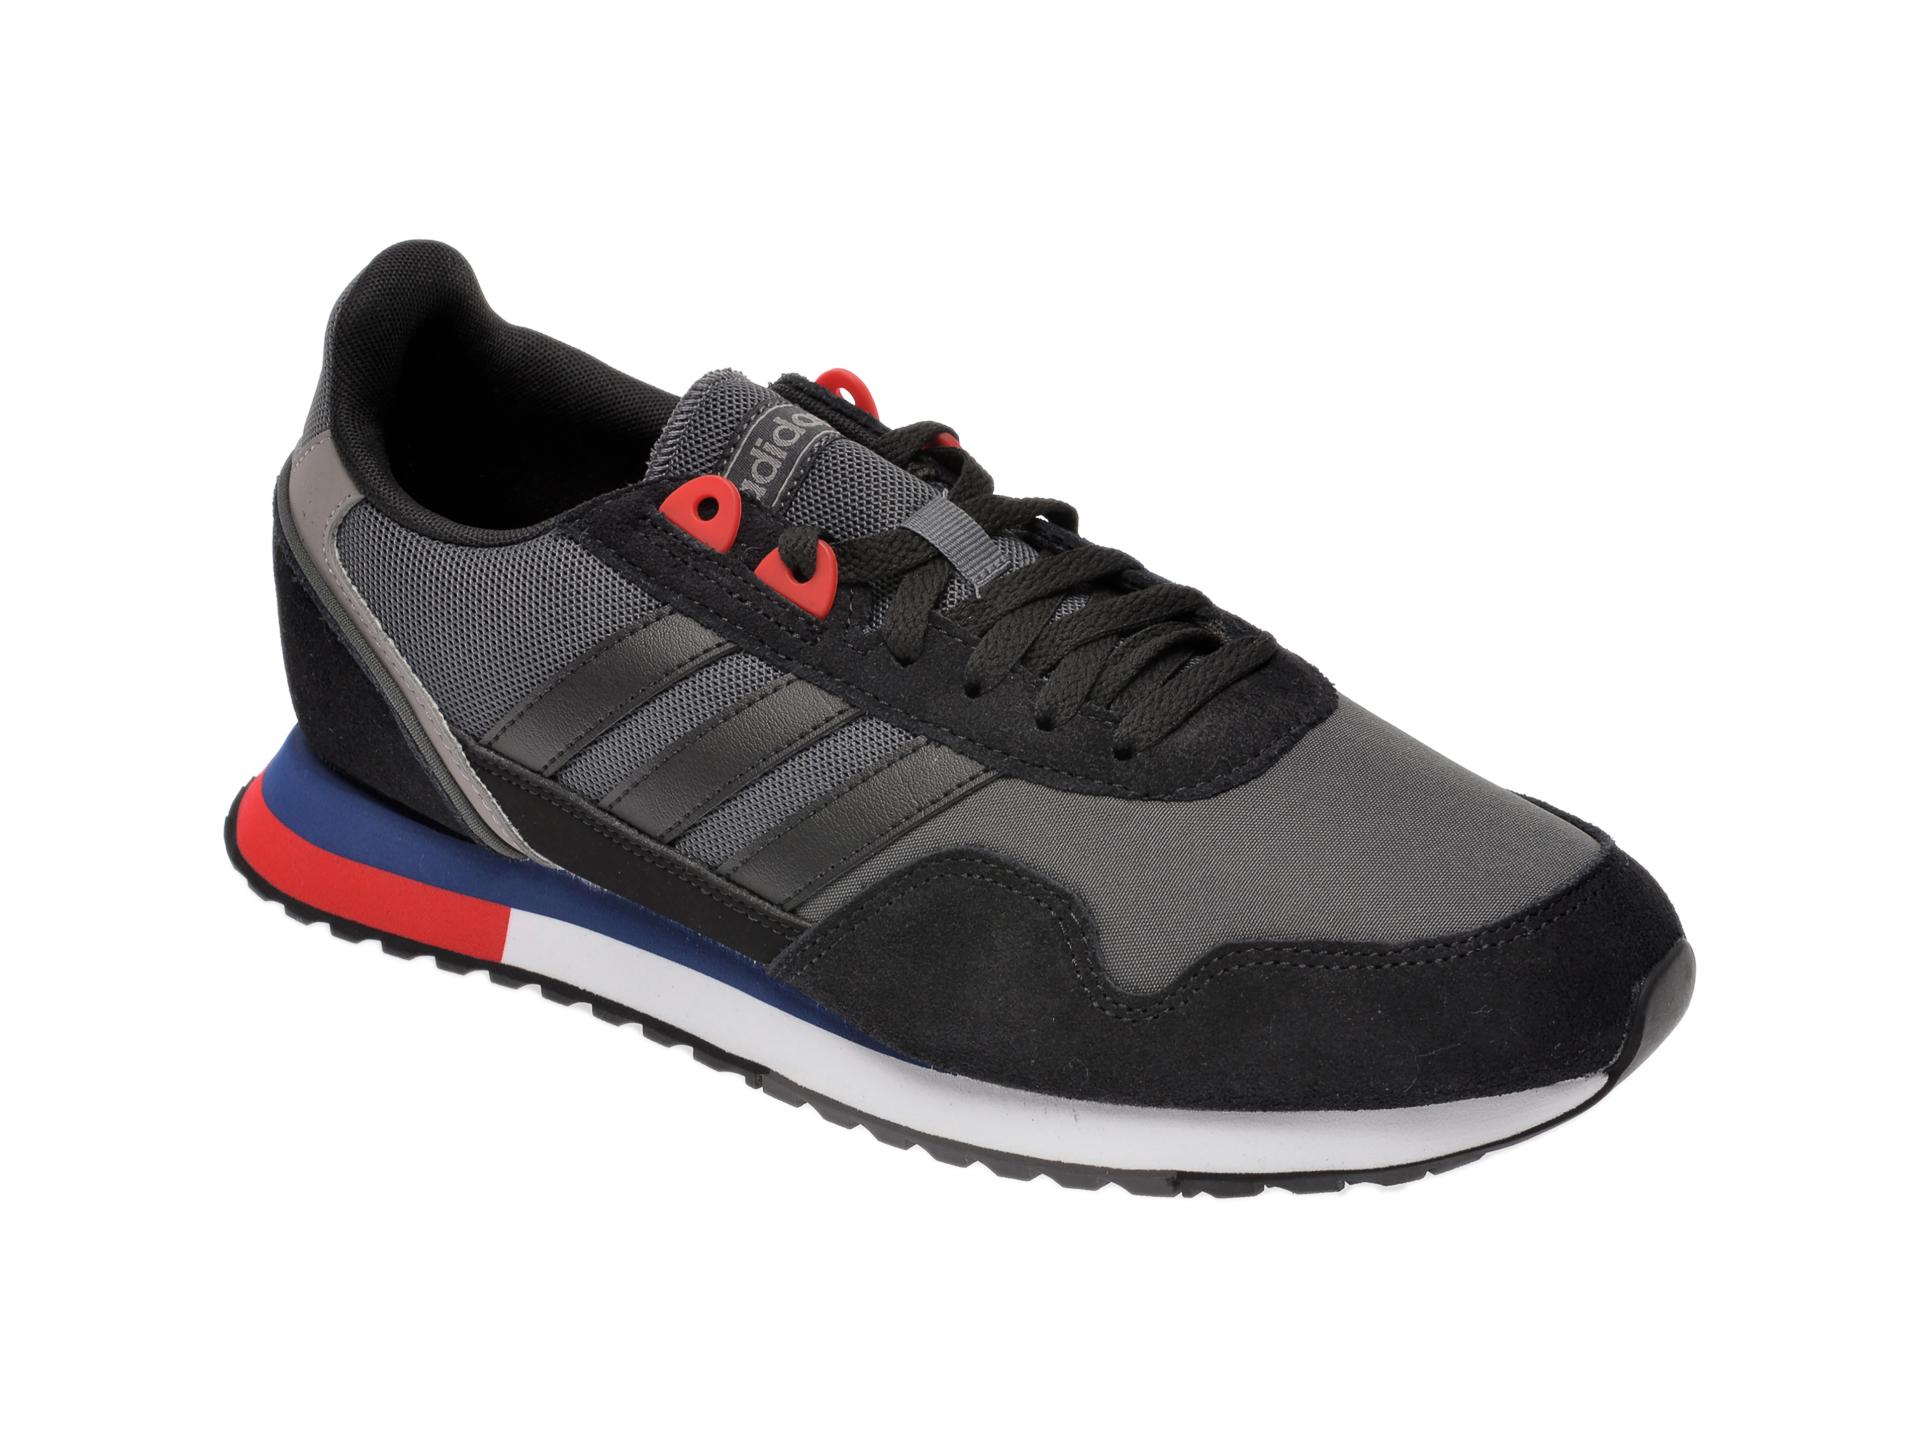 Pantofi Sport Adidas Negri, 8k 2020, Din Material Textil Si Piele Intoarsa